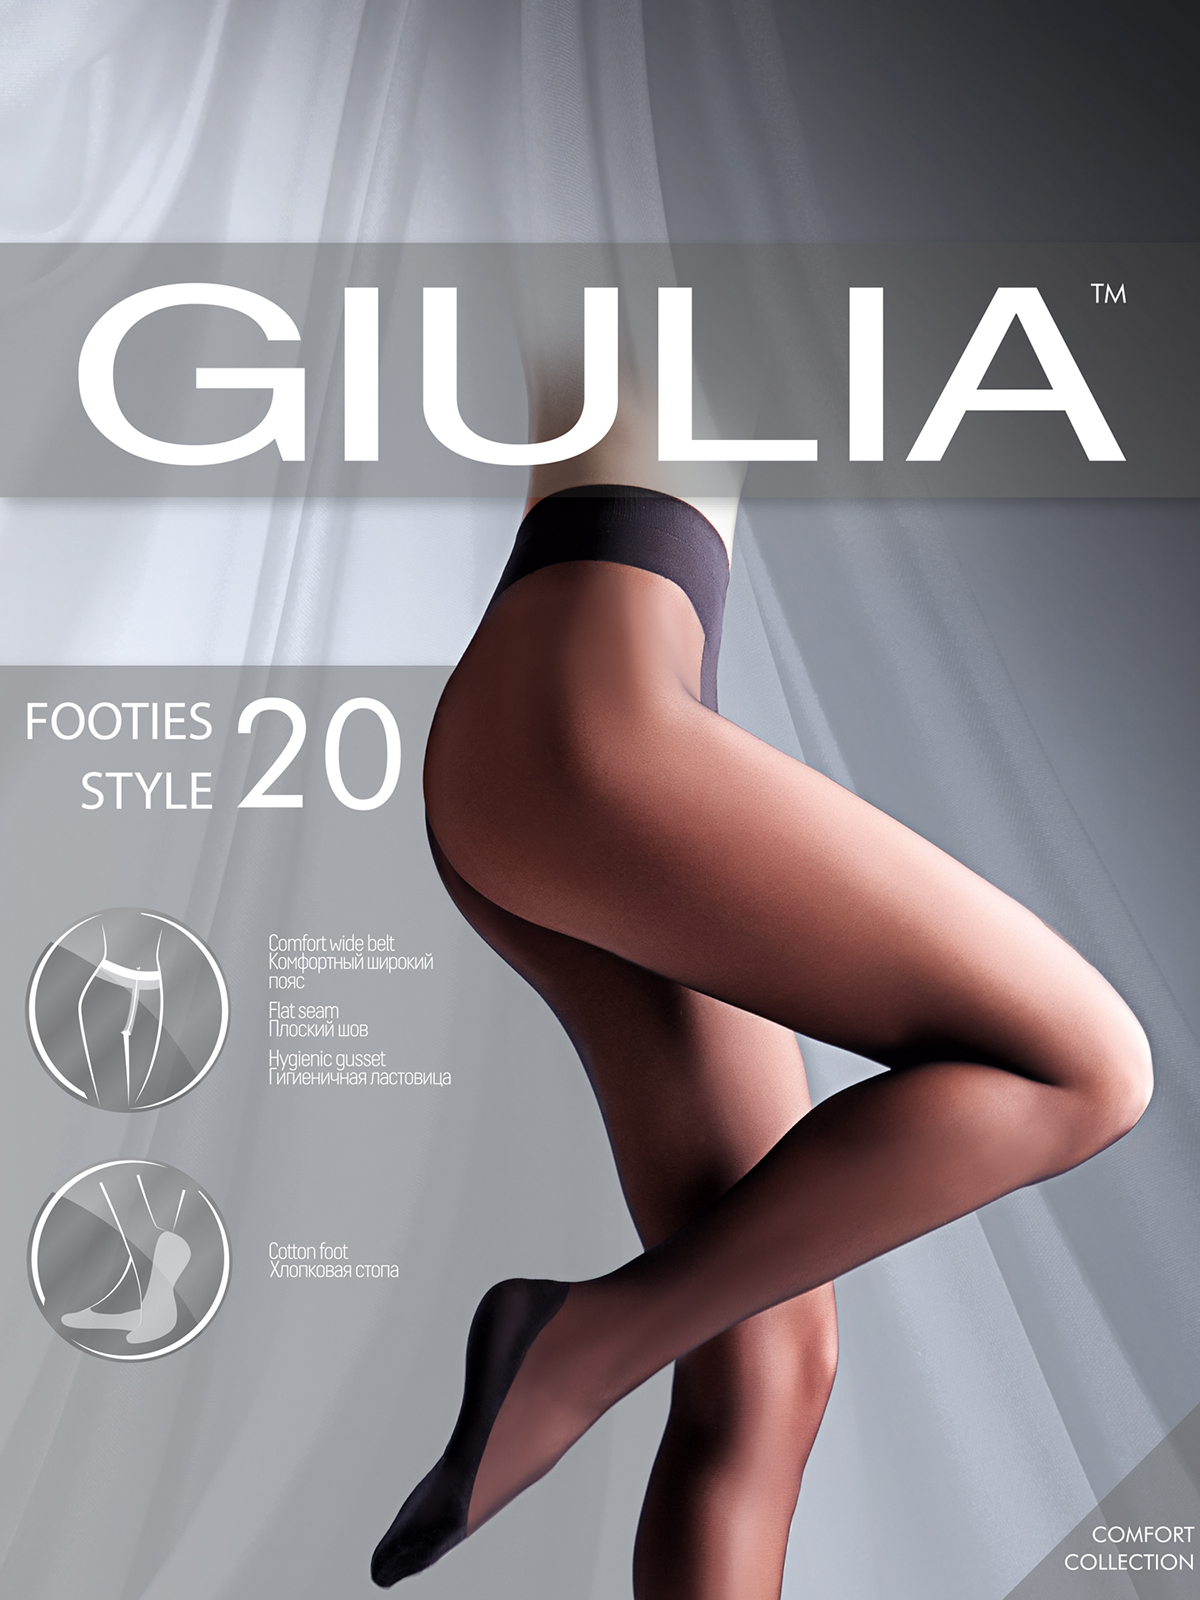 aded5acbdf7b Колготки Giulia - выбирайте и покупайте женские колготки Giulia в ...